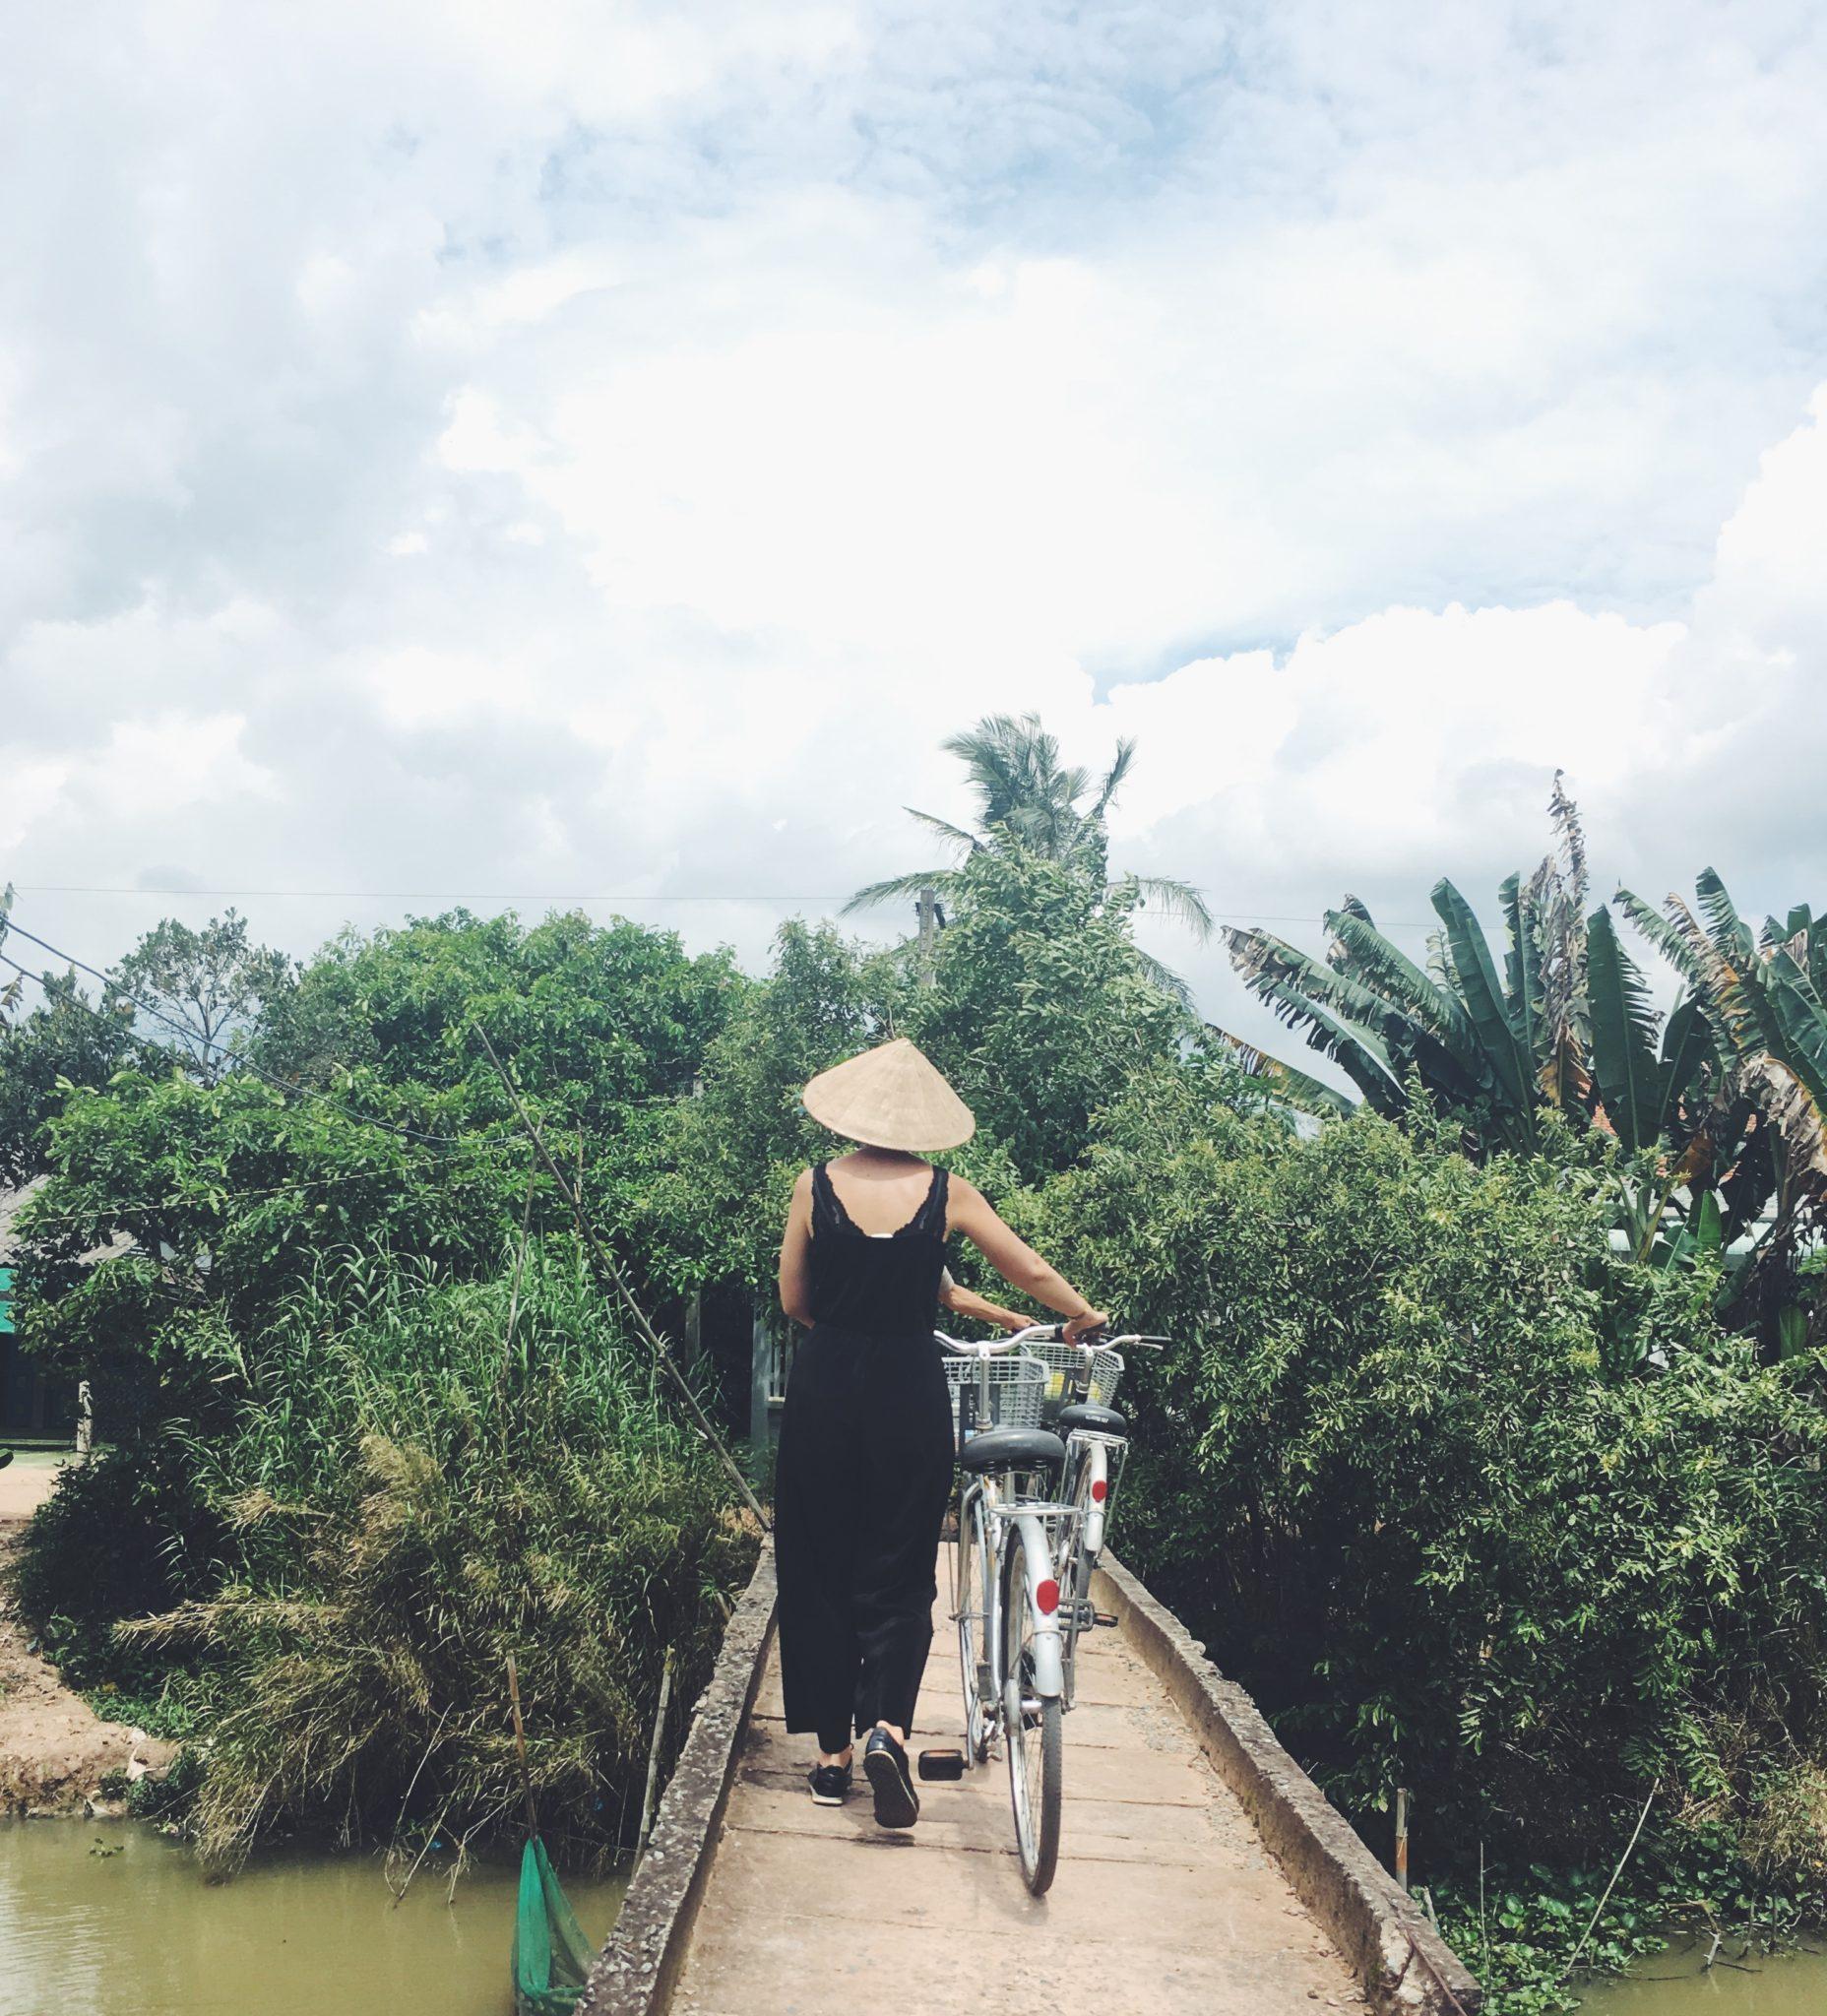 Mekong Delta, Ho Chi Minh